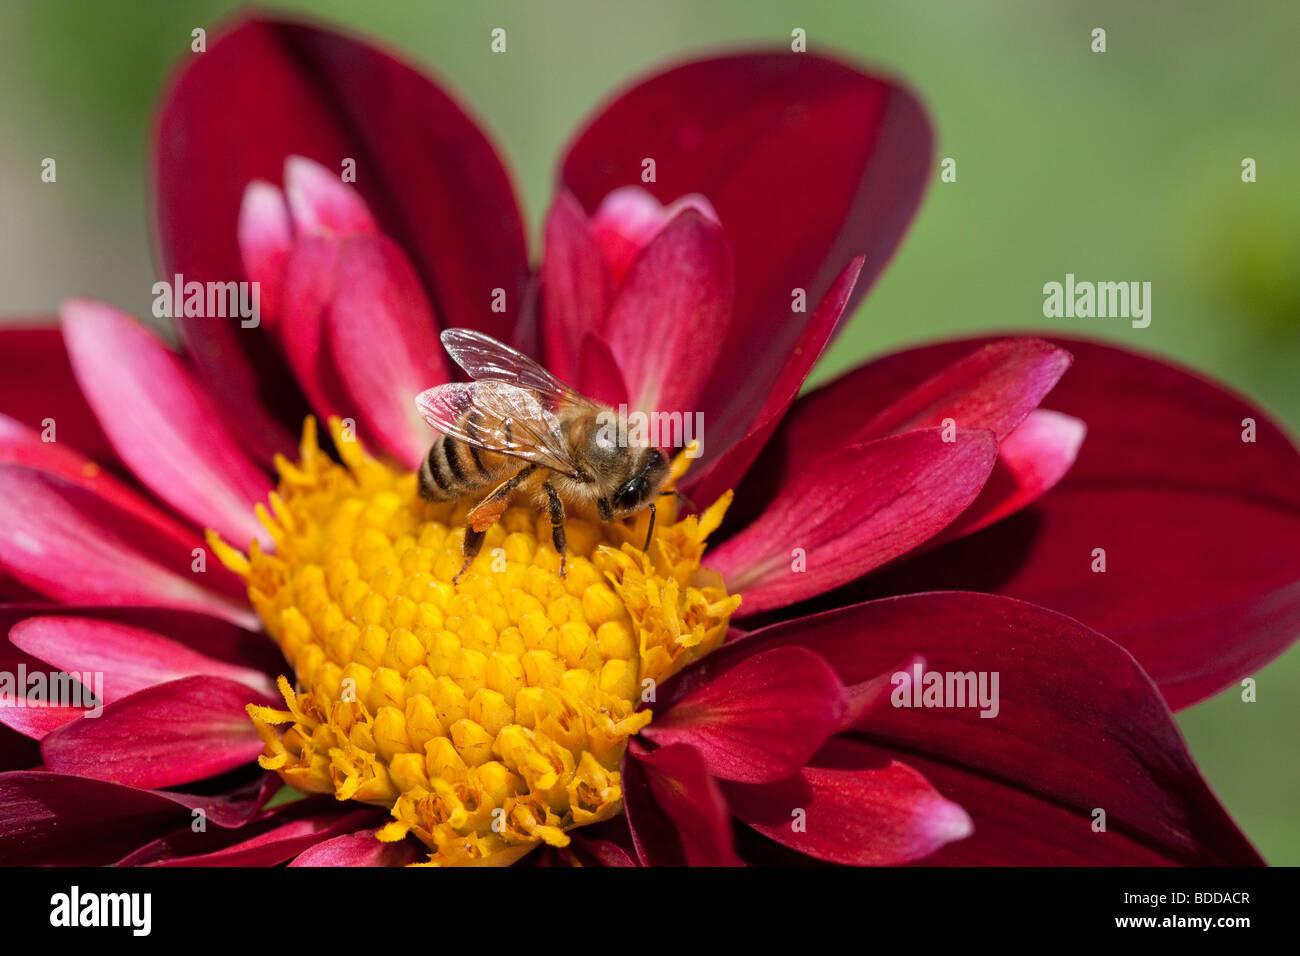 Honigbiene auf Blume Stockbild